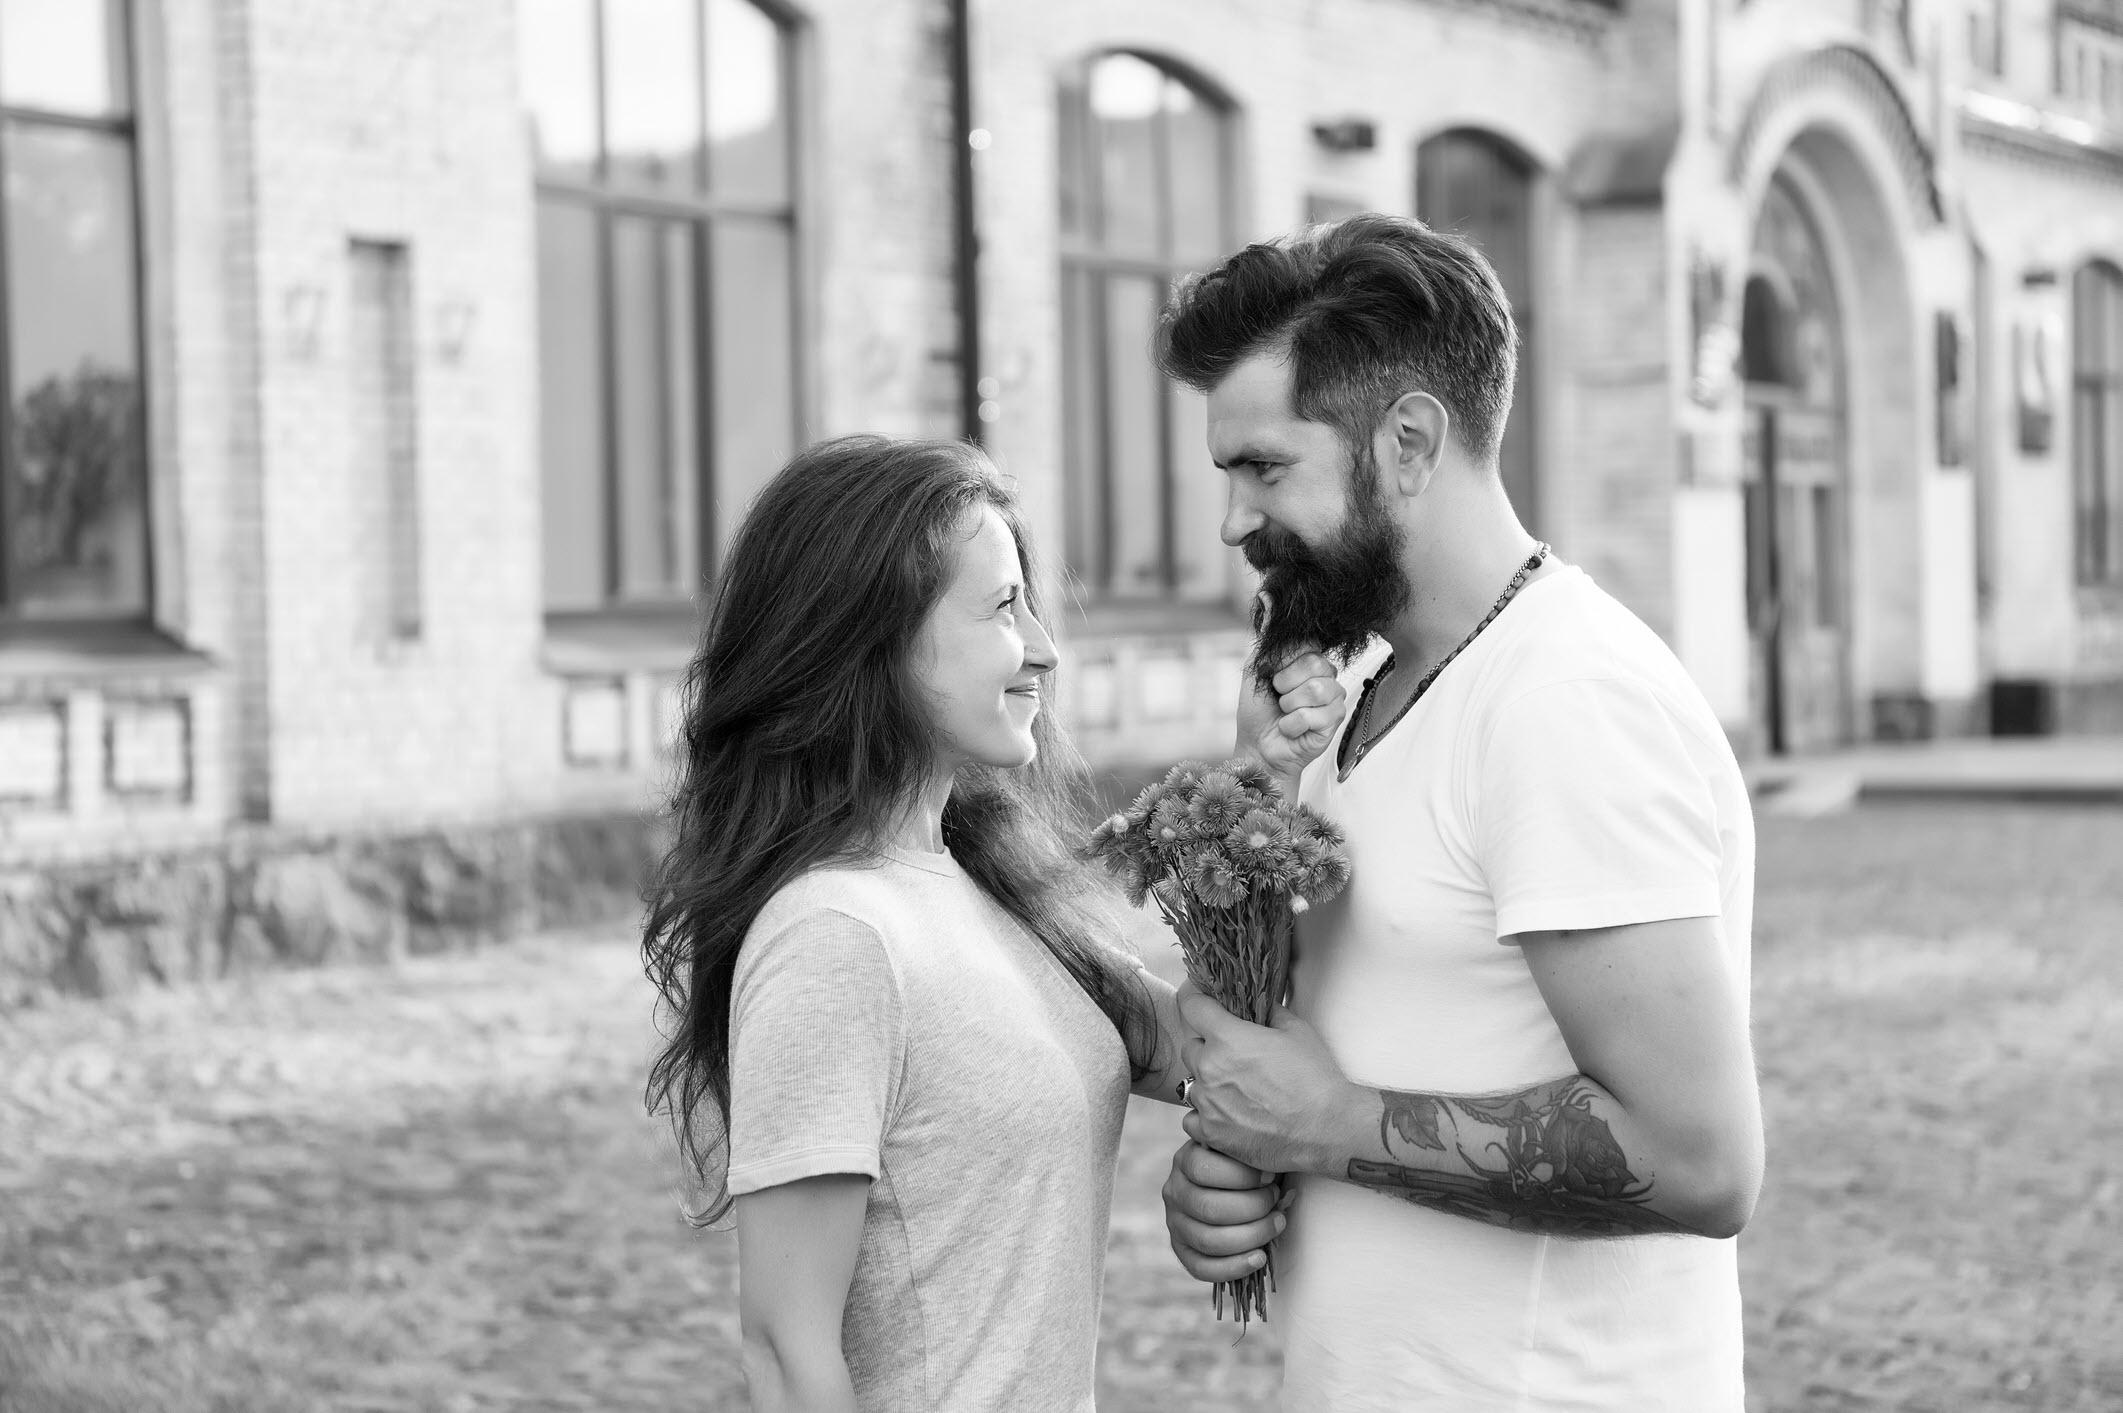 Couple in love happy celebrate anniversary.